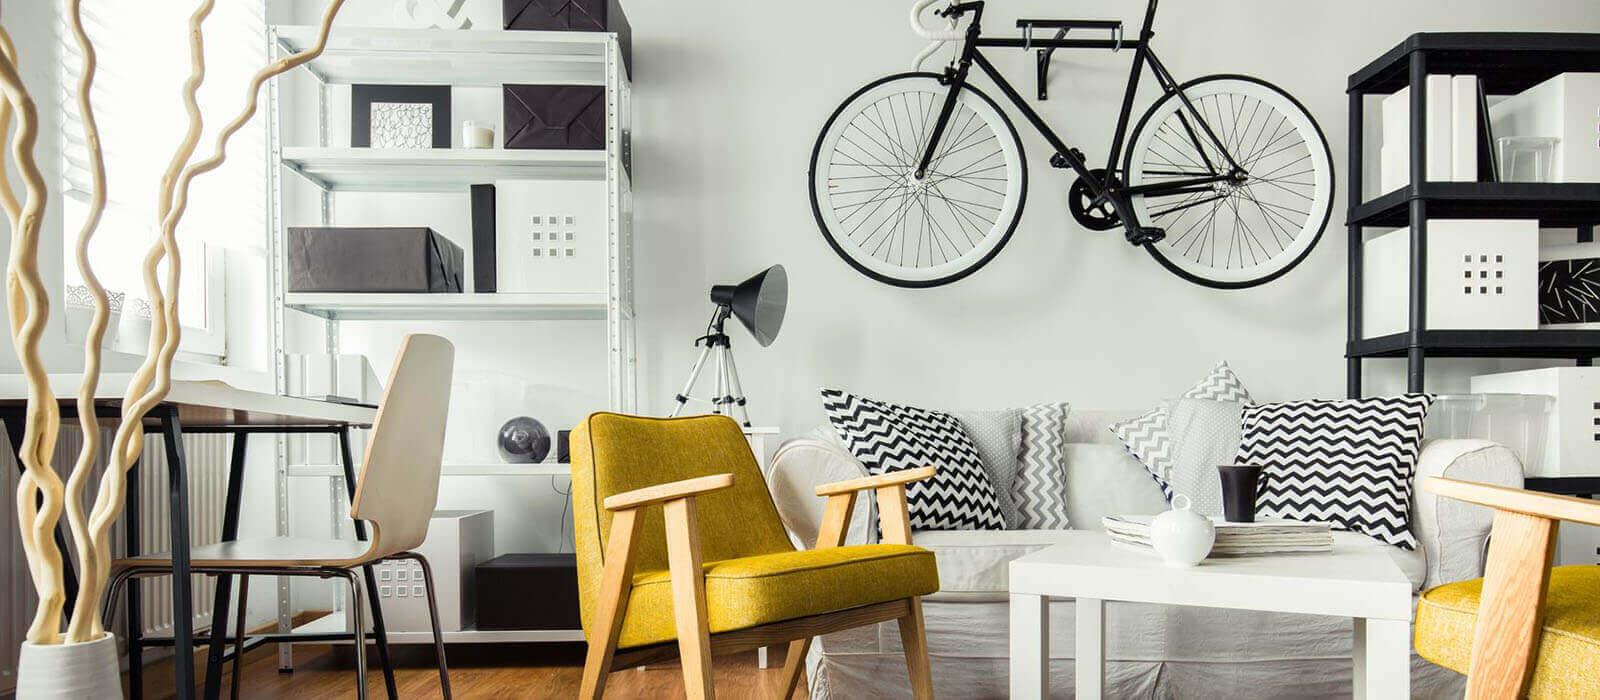 Slide-1_jasa-desain-interior-rumah-apartemen